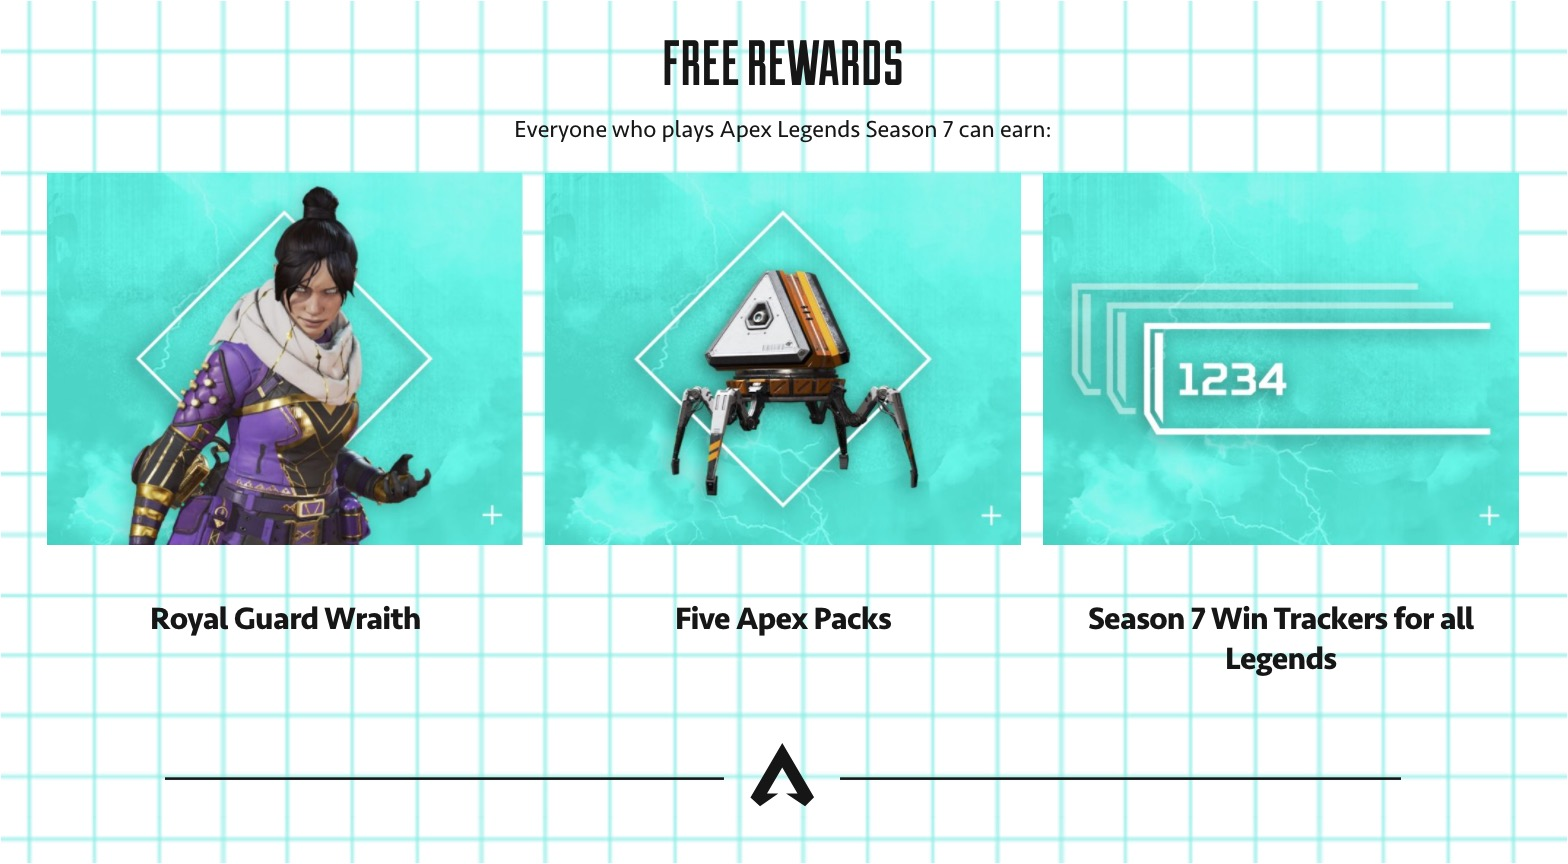 Apex Legends free rewards